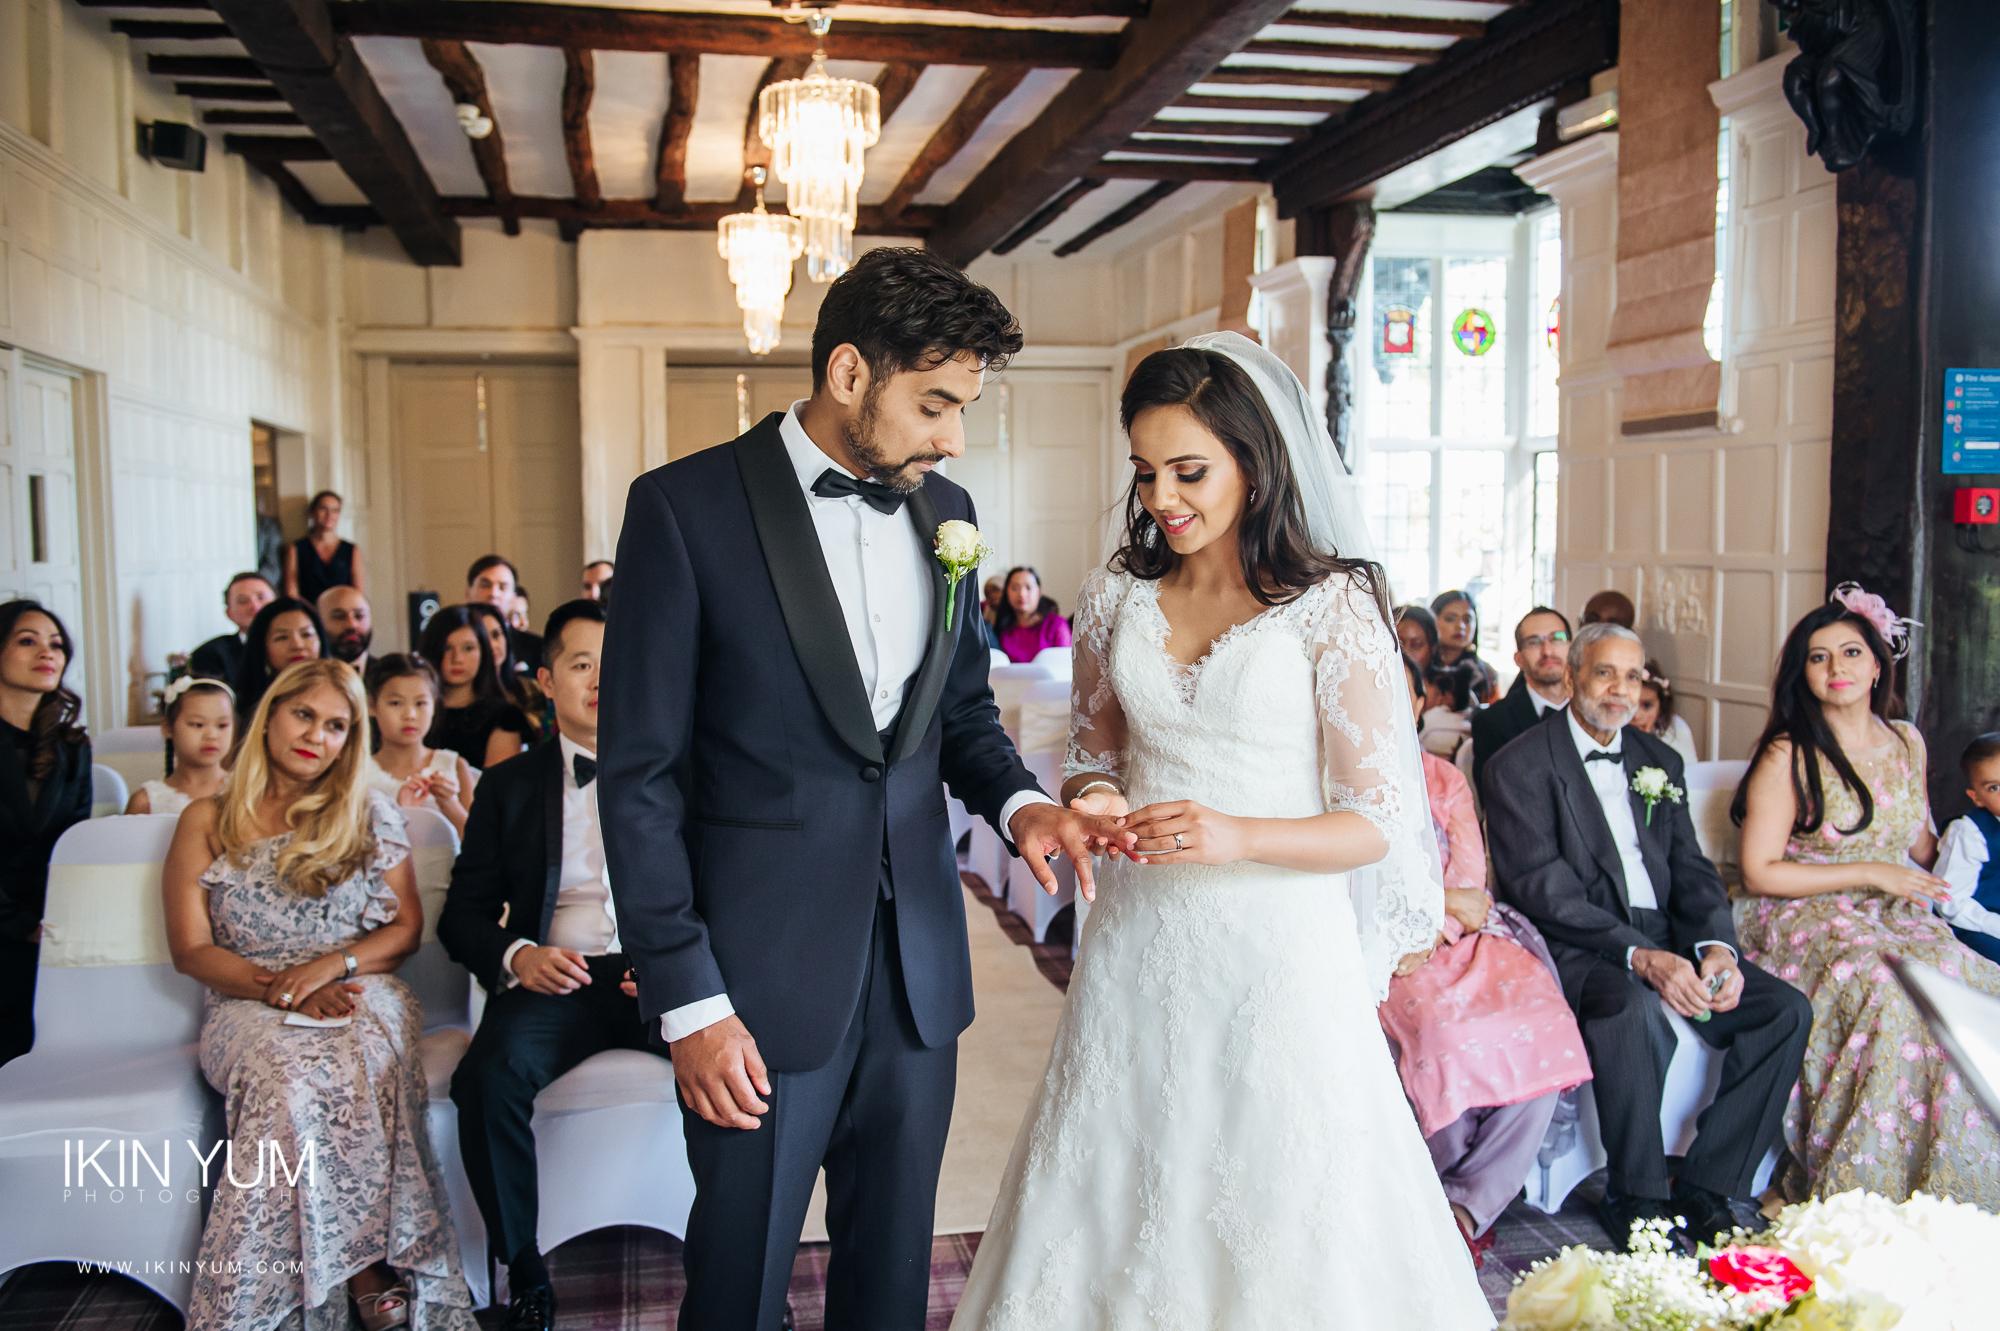 Laura Ashley Manor Wedding - Ikin Yum Photography-060.jpg